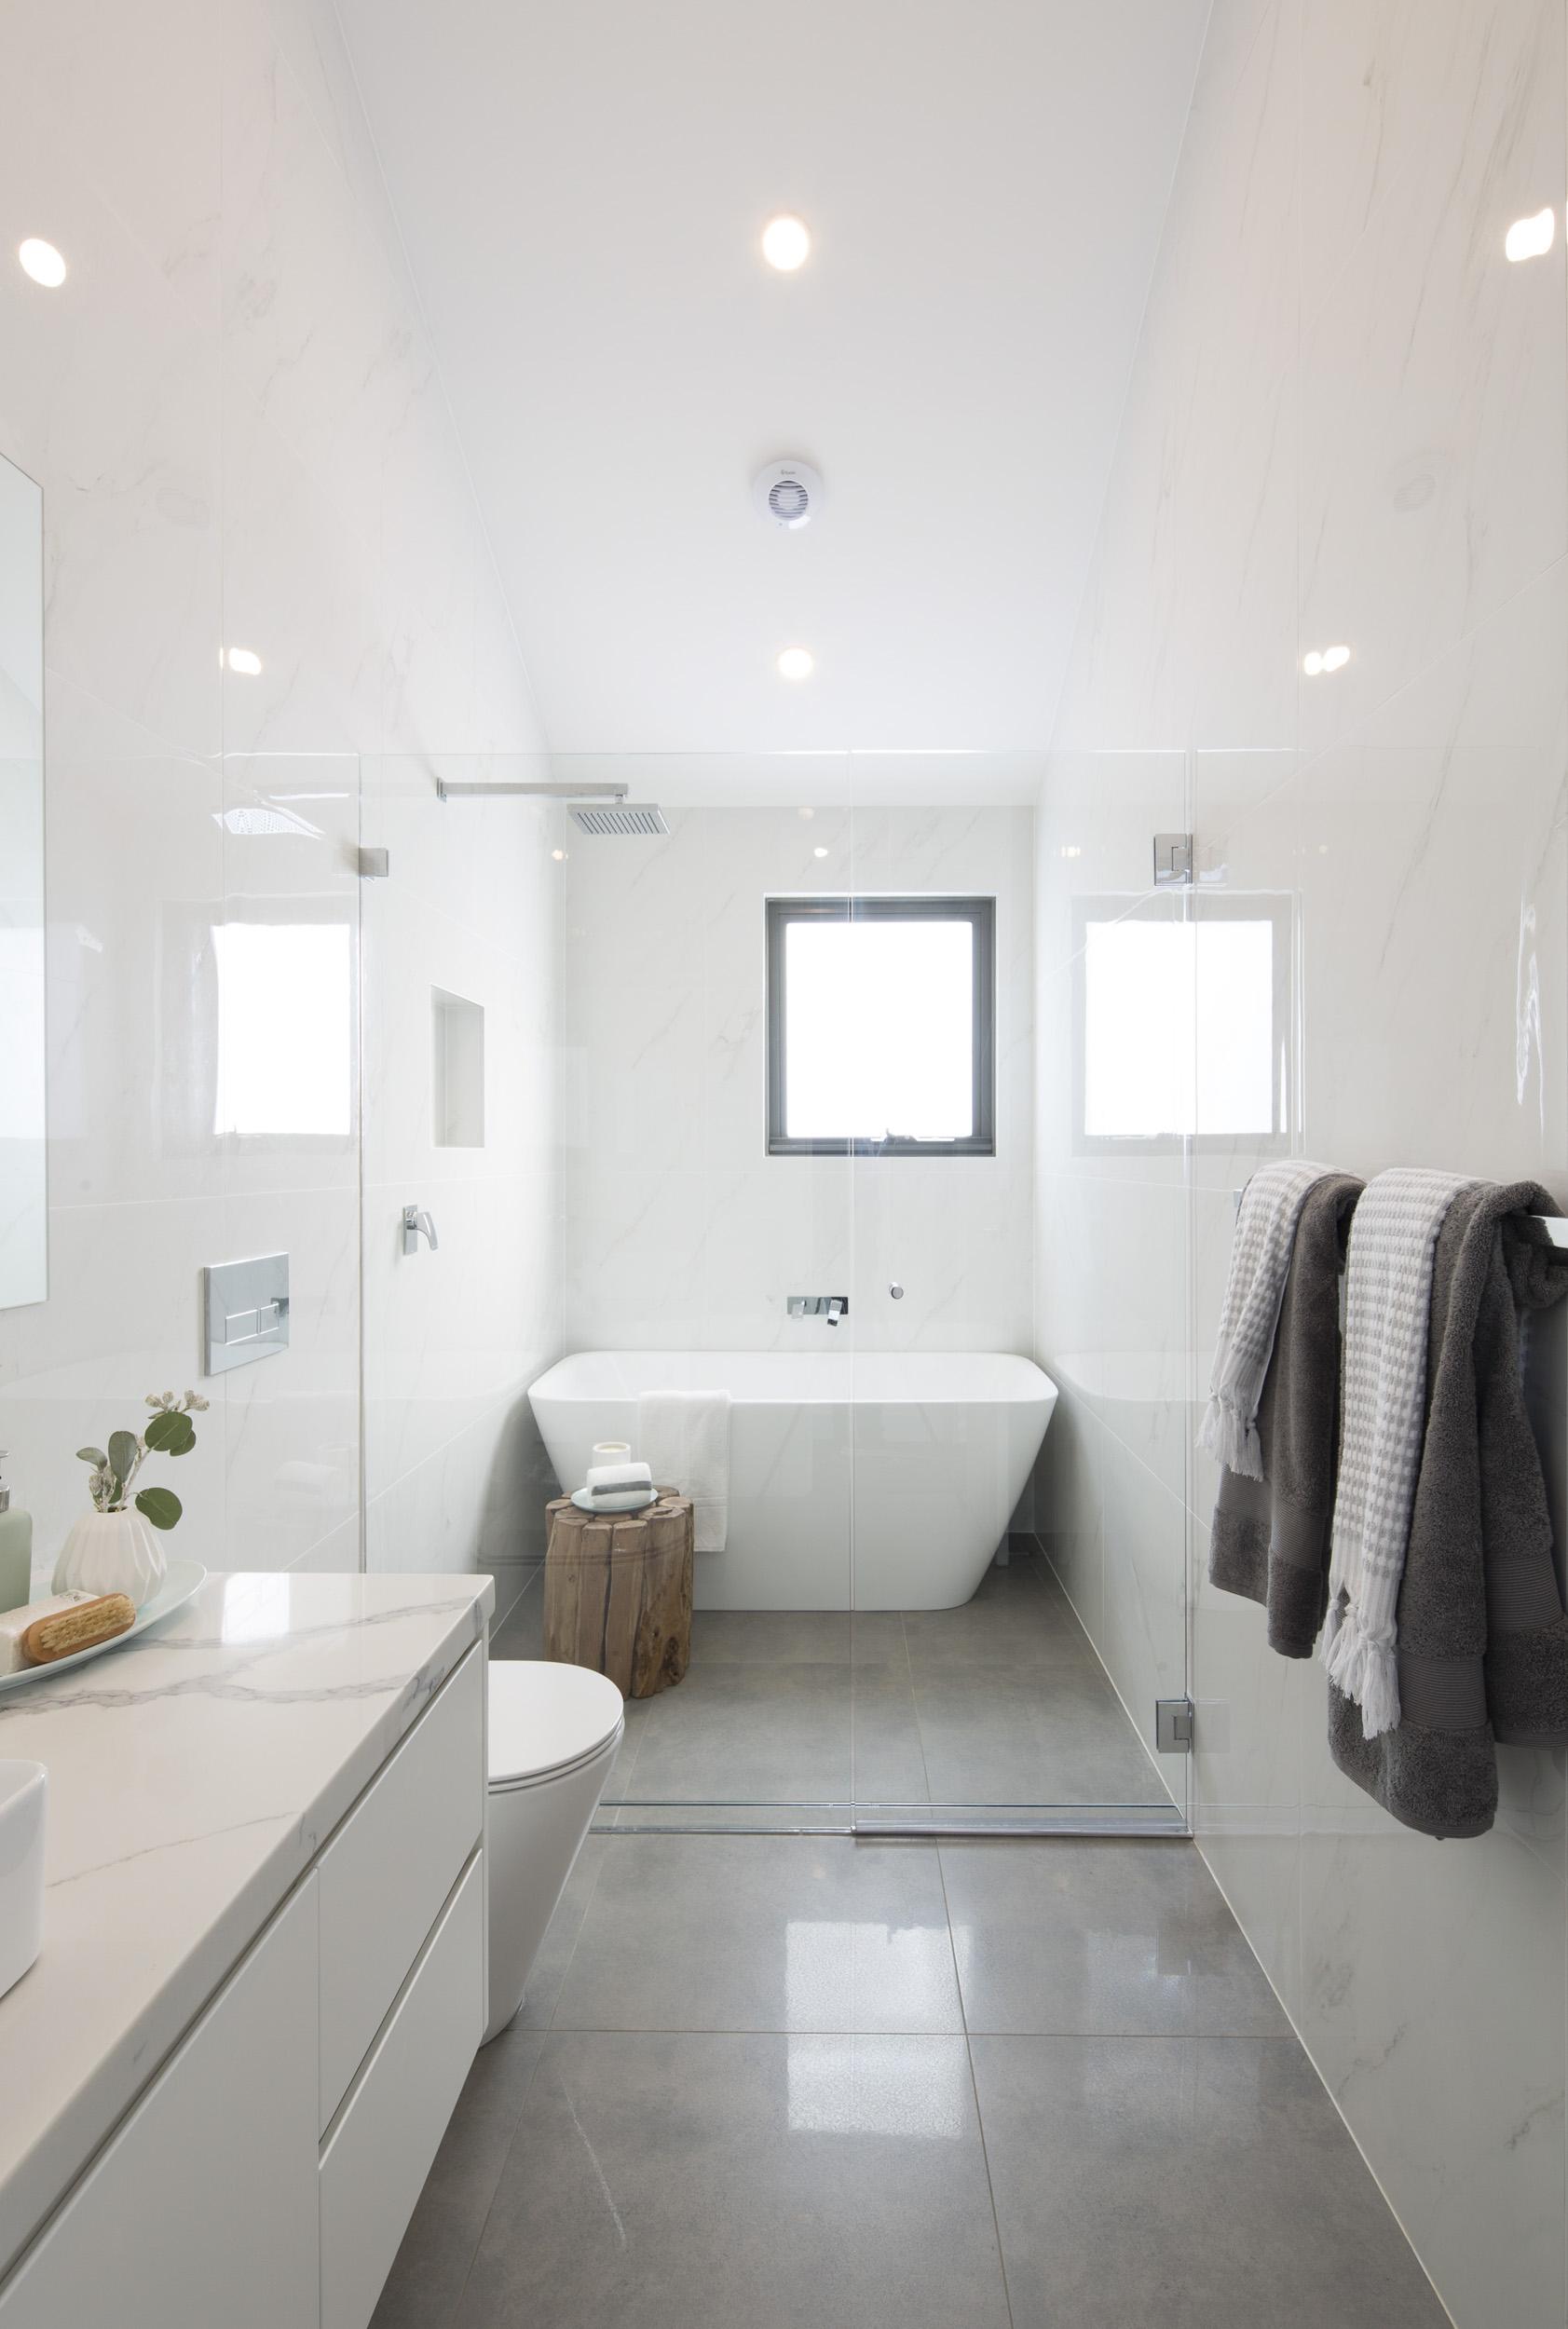 house_photographer_sydney_ns_studio_architects_15.jpg